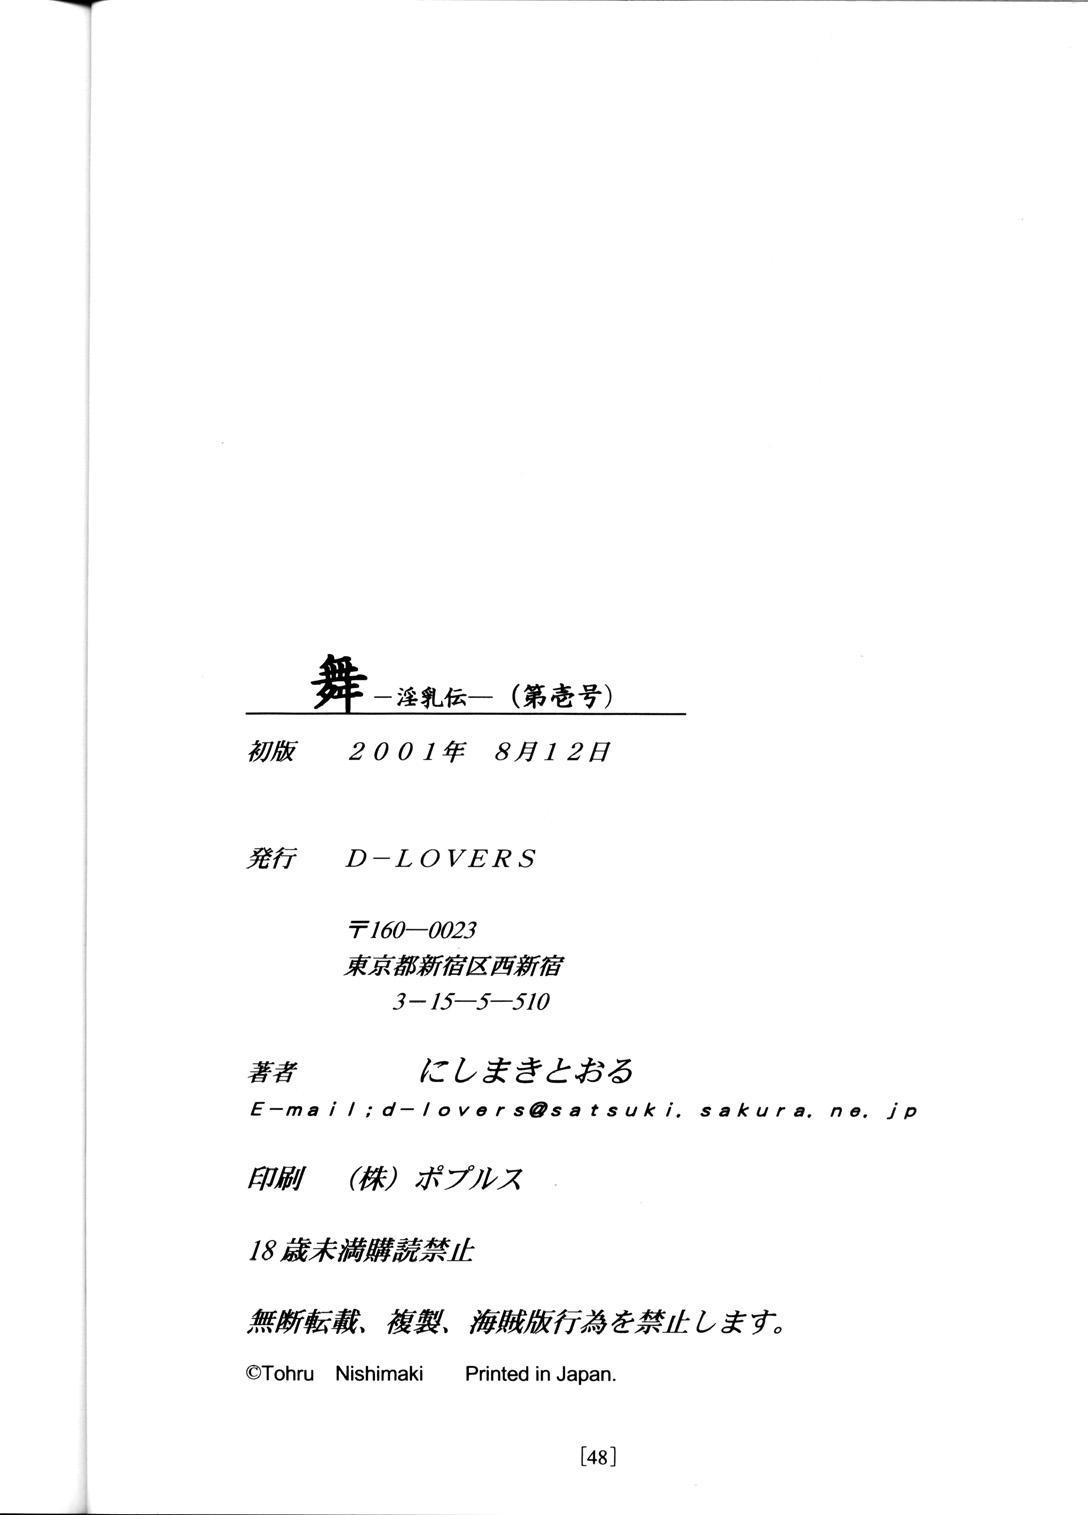 (C60) [D-LOVERS (Nishimaki Tohru)] Mai -Innyuuden- Daiichigou (King of Fighters) 46